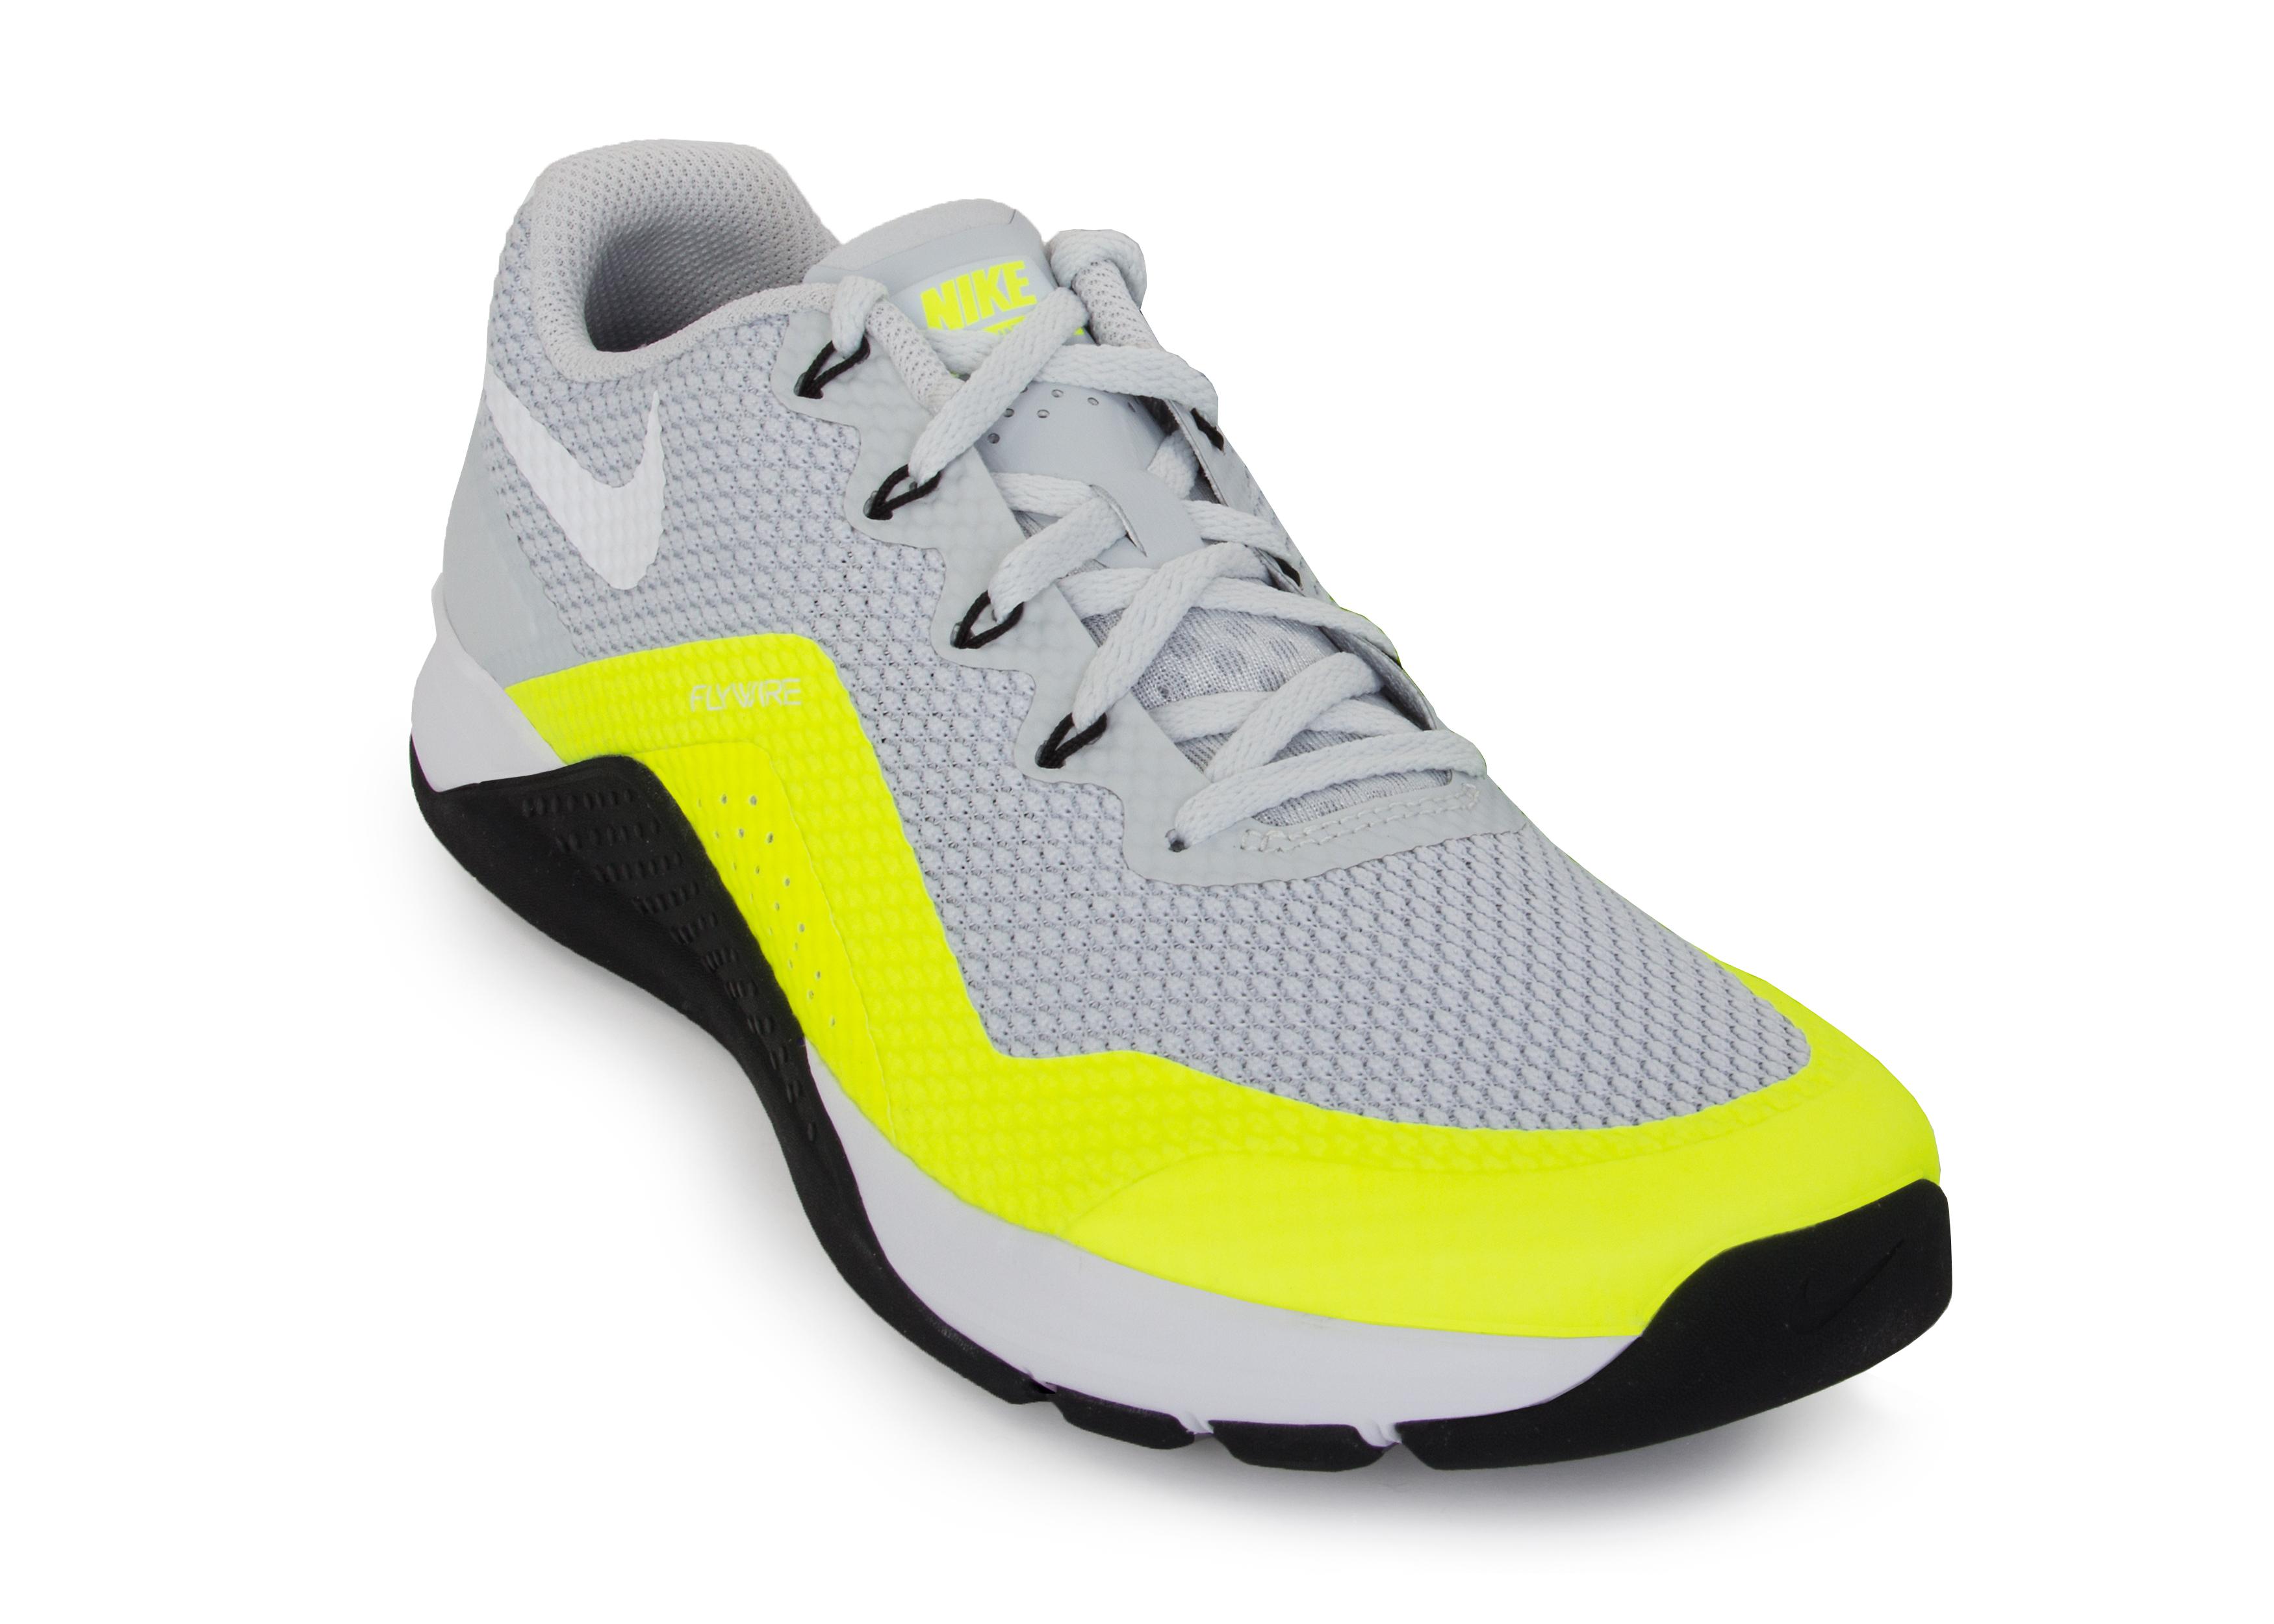 Nike Metcon Repper DSX Training Shoe